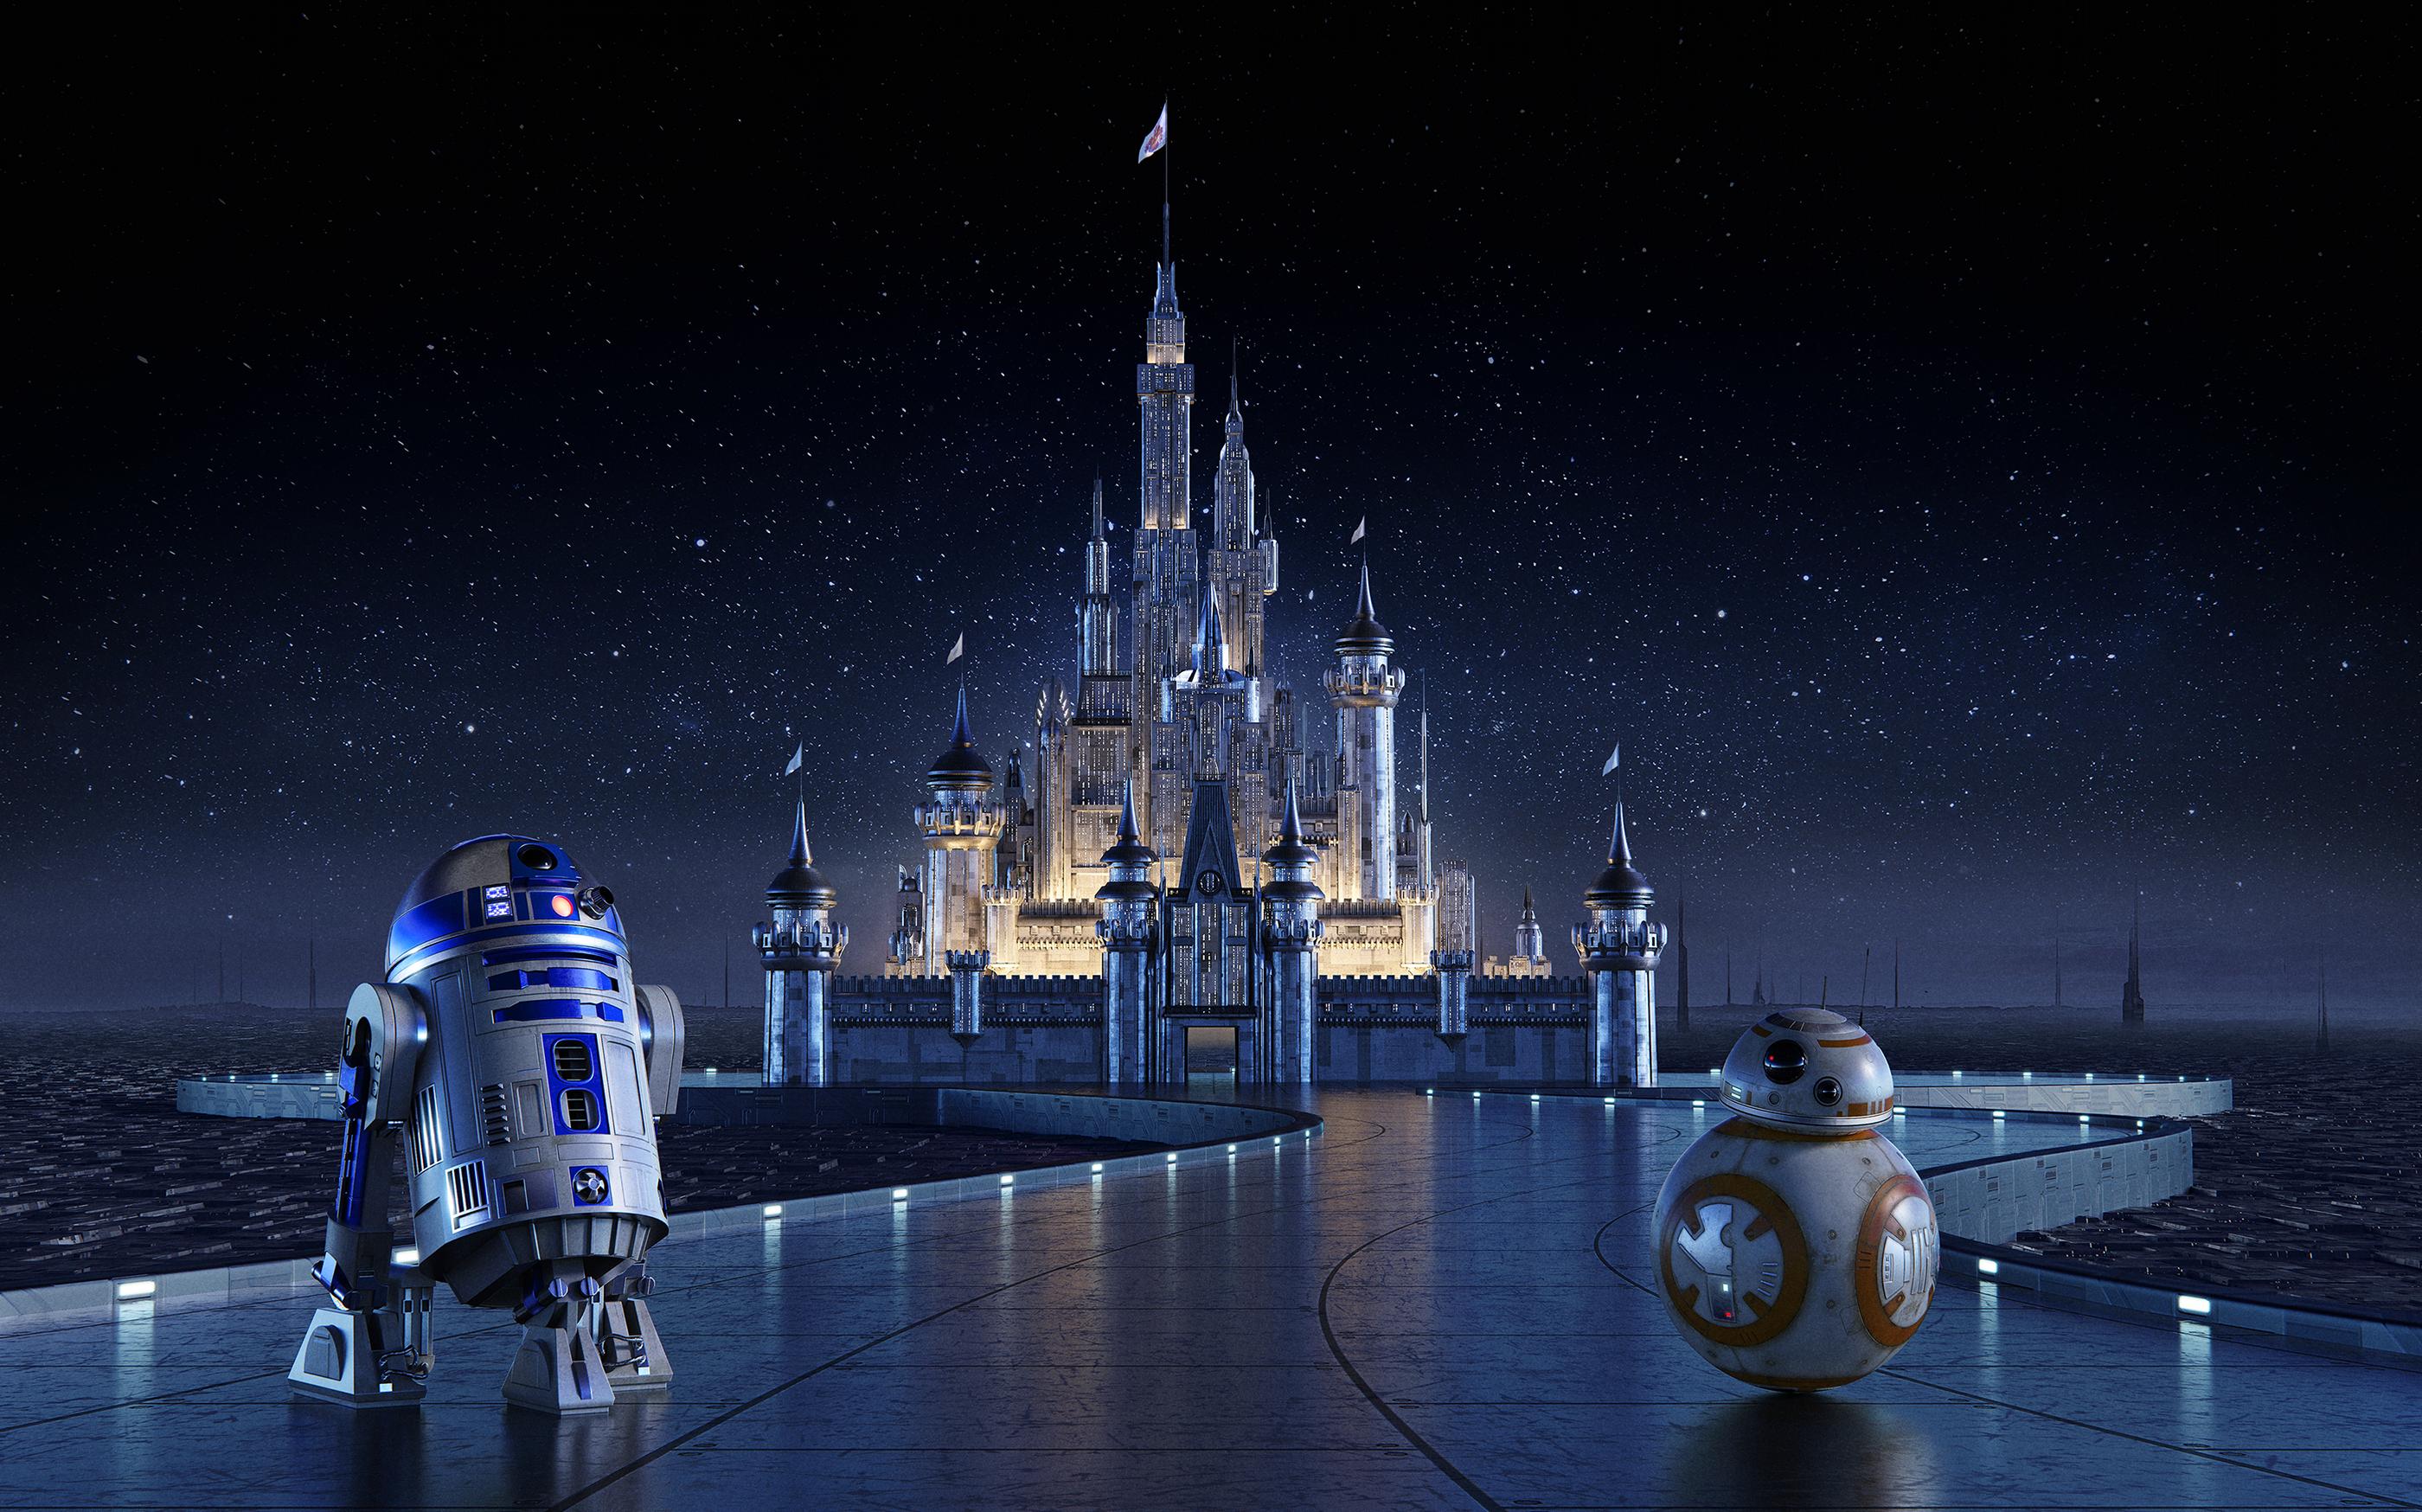 Star Wars Disney Castle Concept On Behance Star Wars Wallpaper Star Wars Movies Posters Star Wars Background